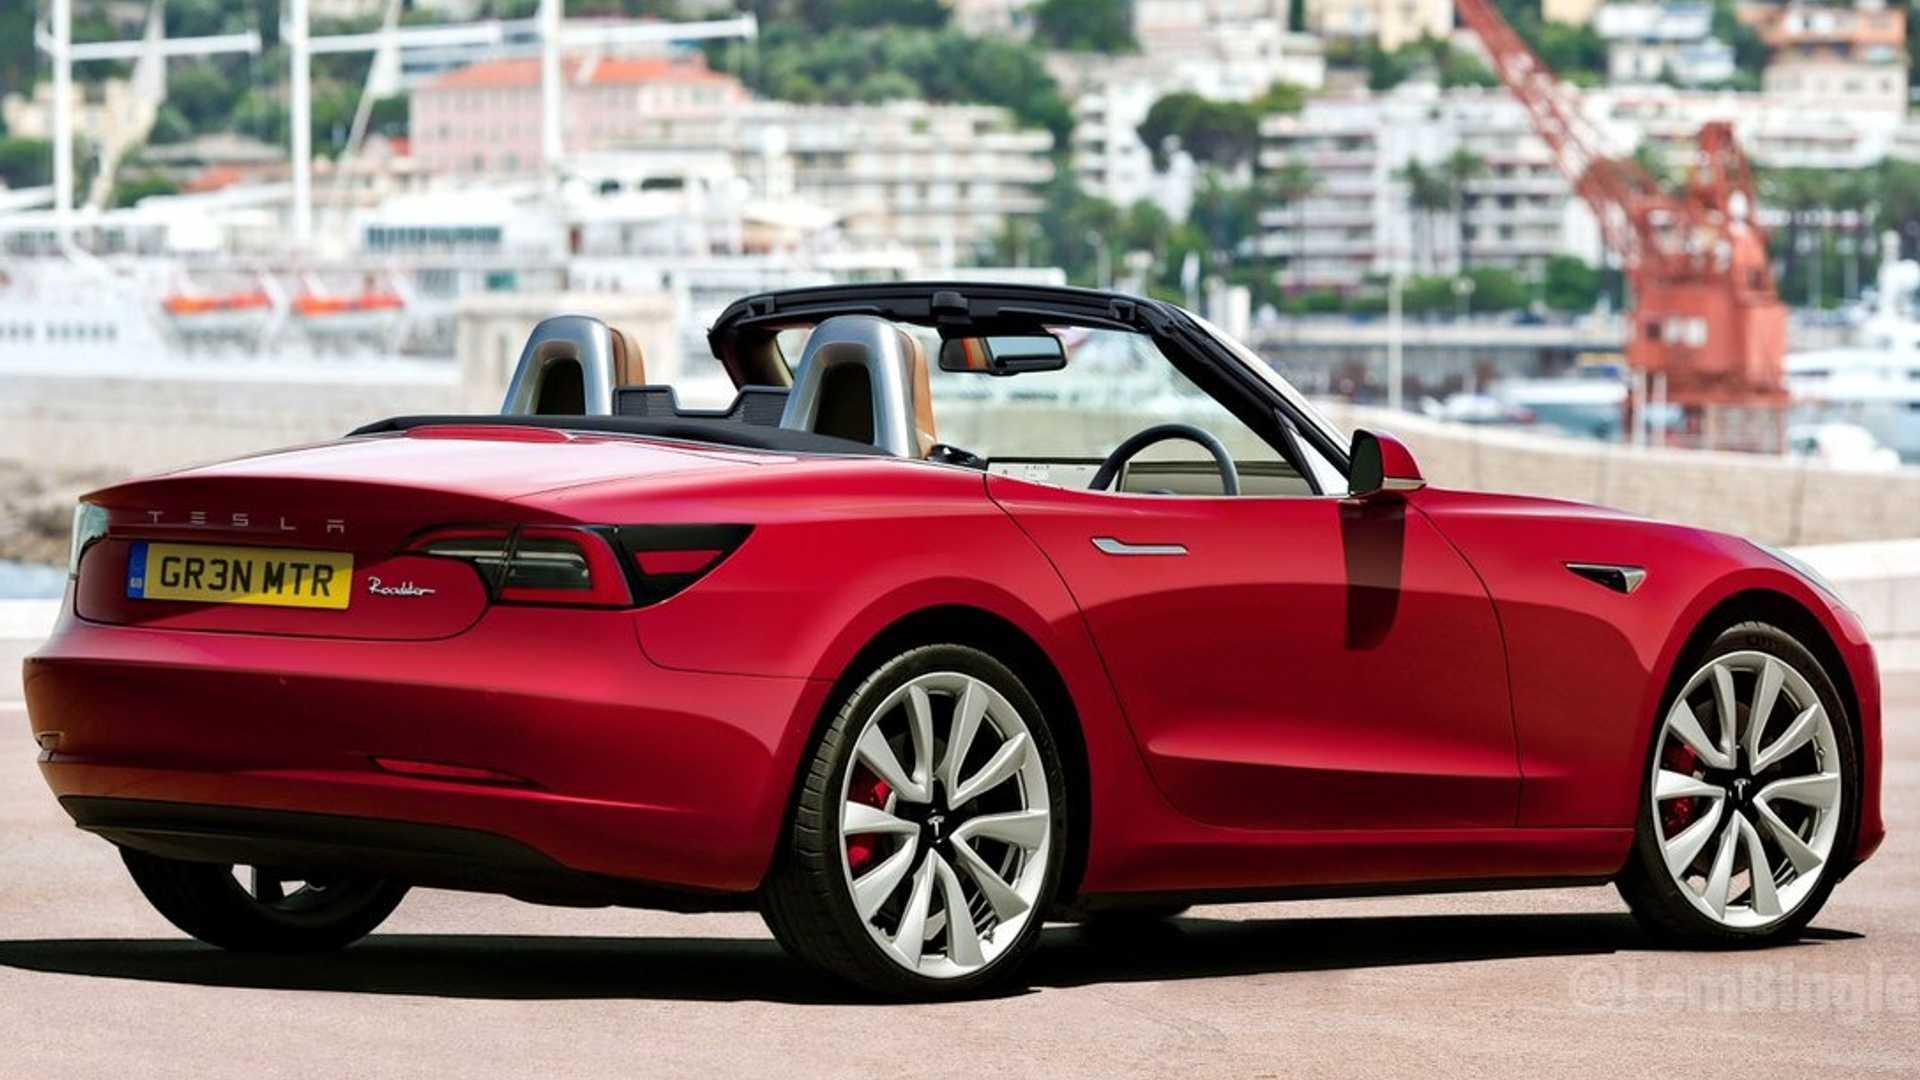 Tesla Model 3 Convertible Coupe Rendered To Take On Mazda MX-5 Miata